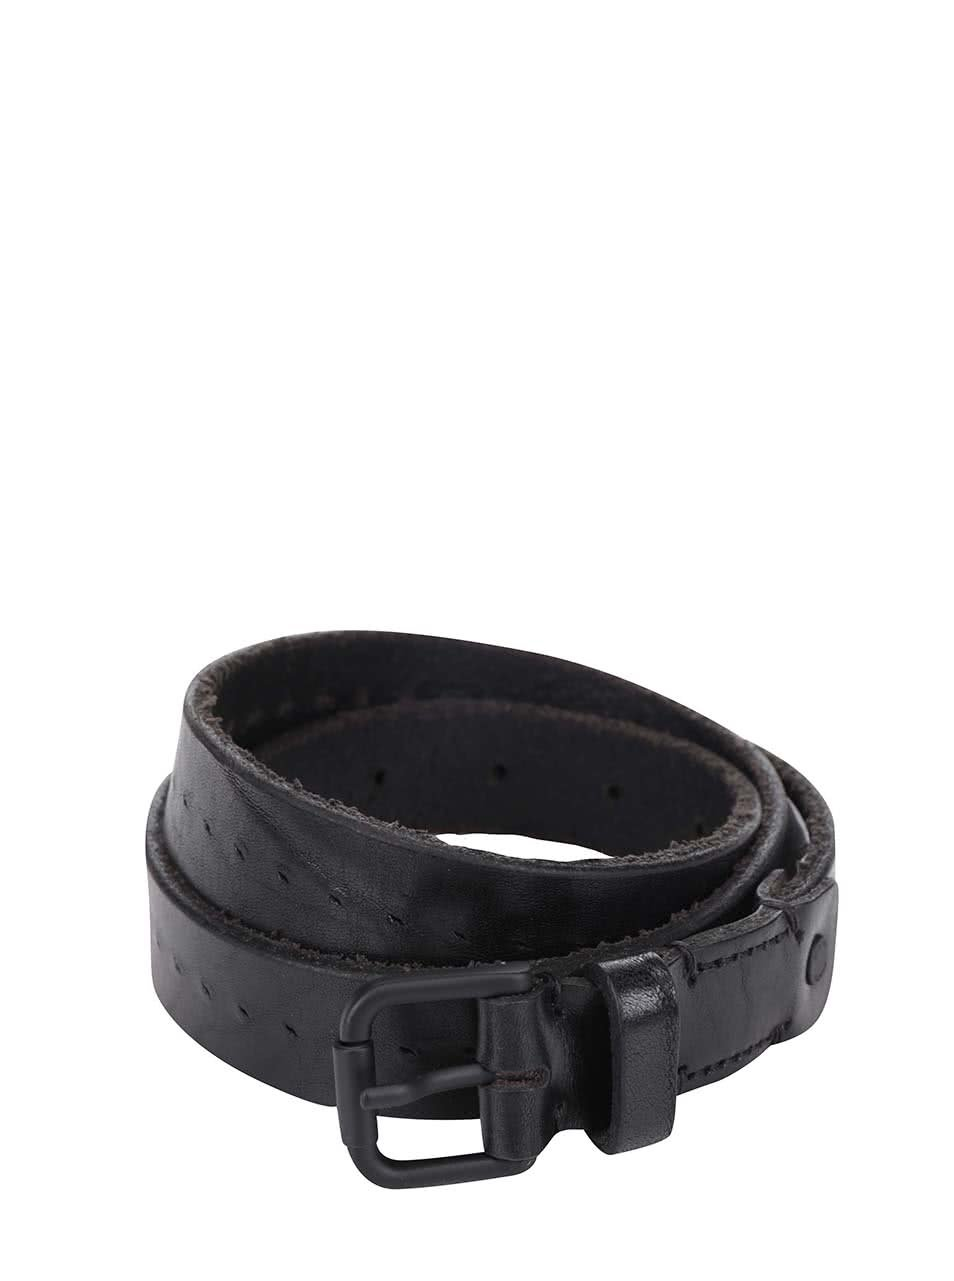 Černý kožený pásek Selected Homme Peter